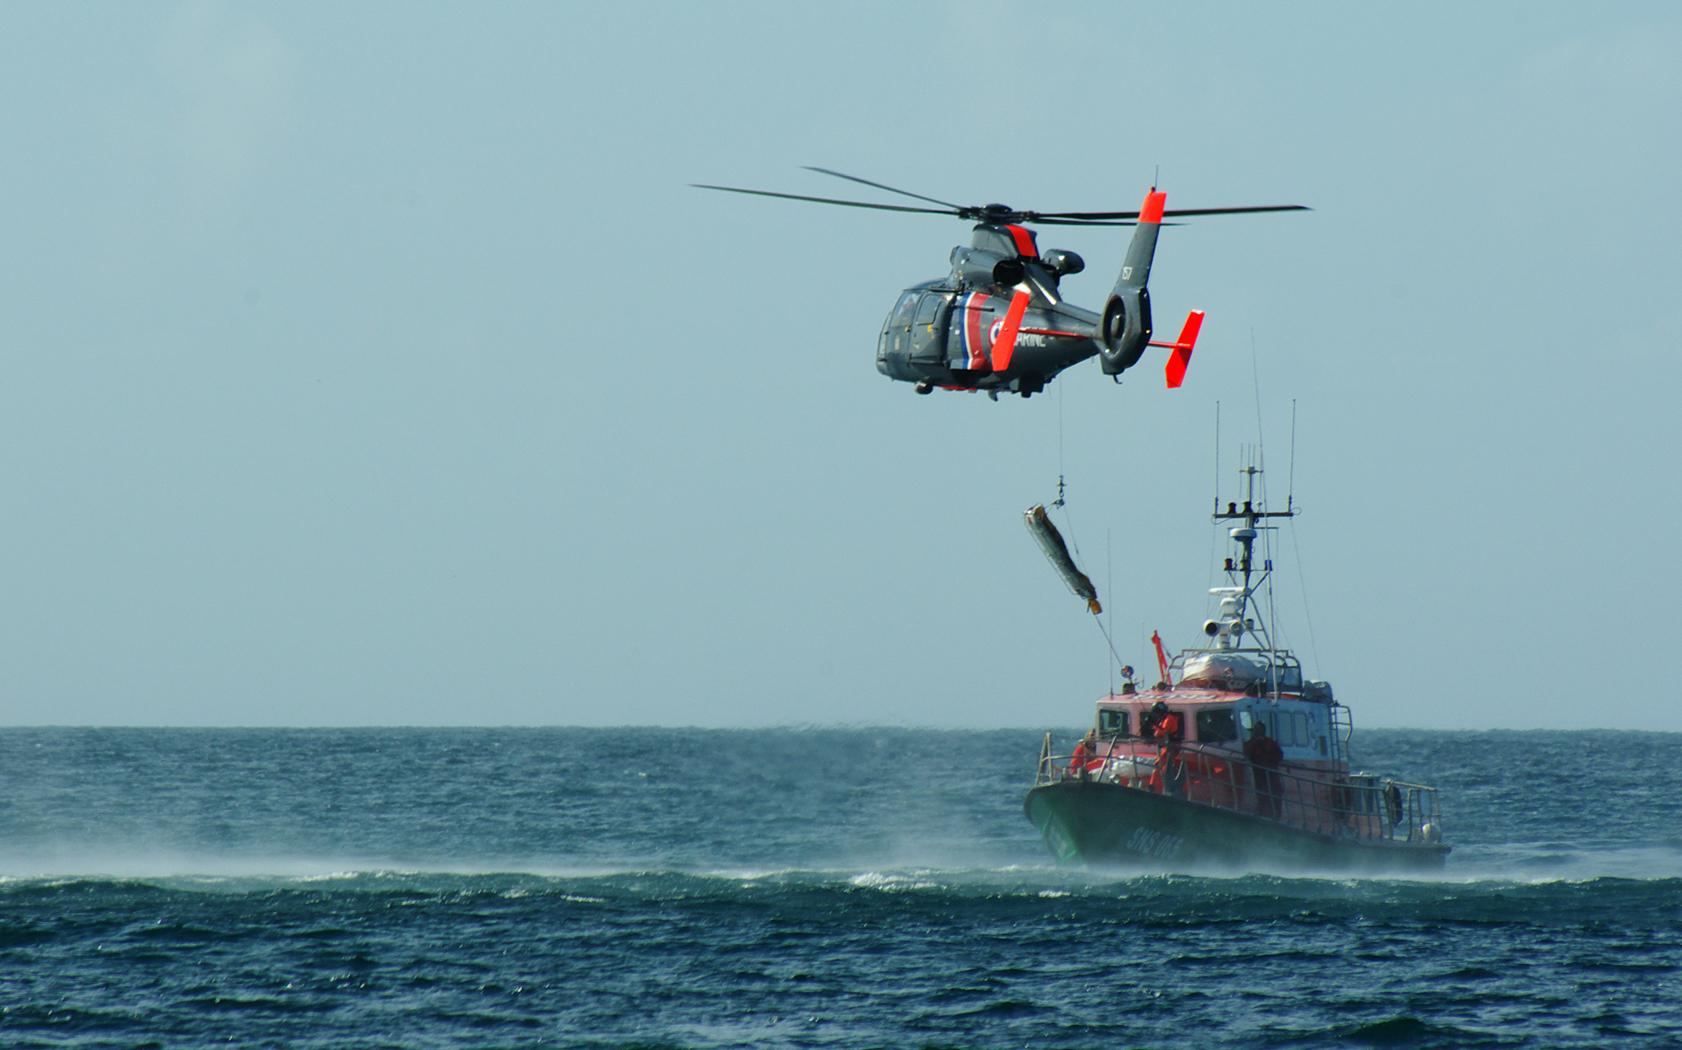 Hélicoptère, sauvetage